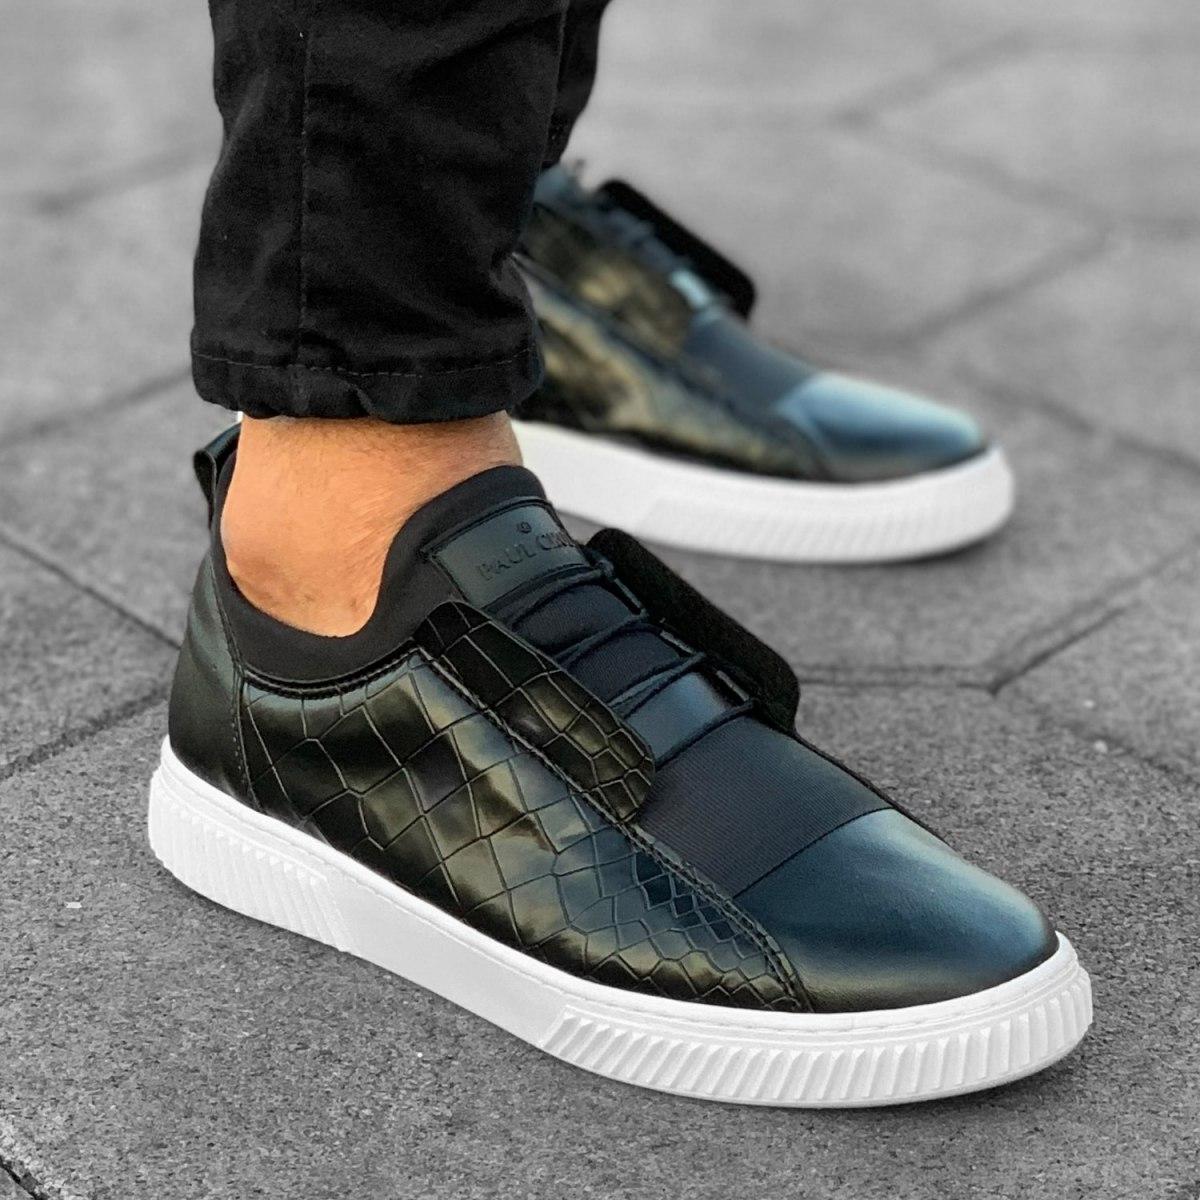 Herren Sneakers Mit Krokodil Leder Optik in Schwarz-Weiß Mv Premium Brand - 4